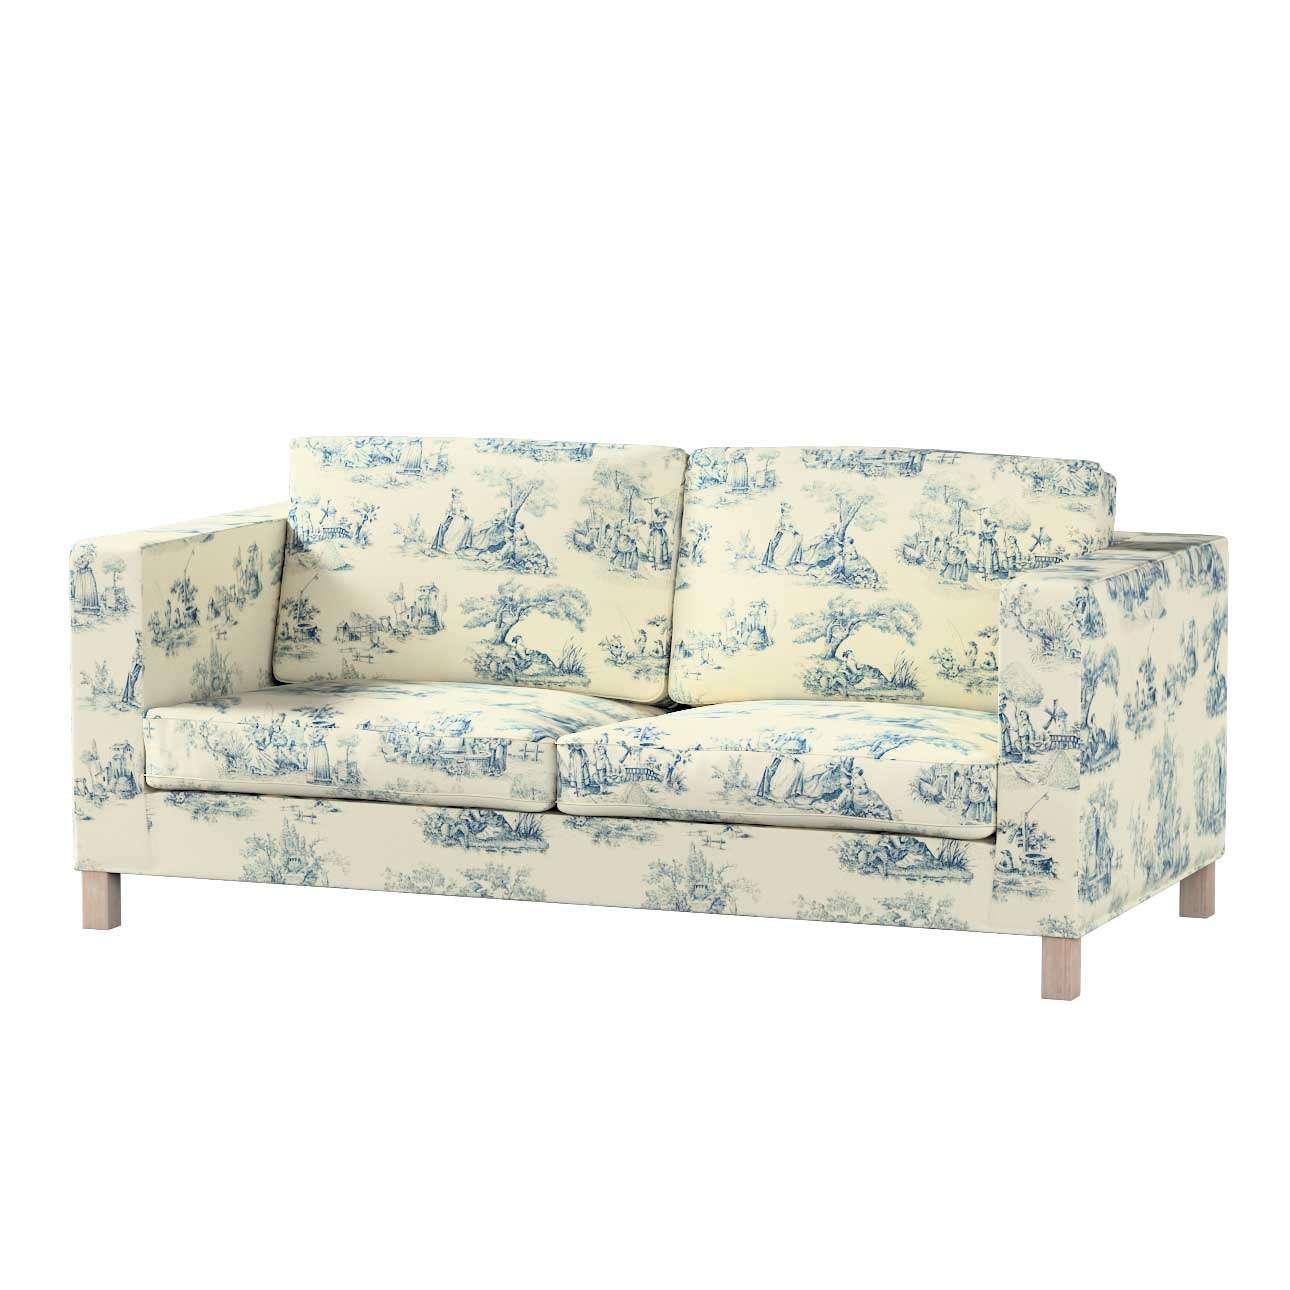 Potah na pohovku IKEA  Karlanda rozkládací, krátký pohovka Karlanda rozkládací v kolekci Avignon, látka: 132-66